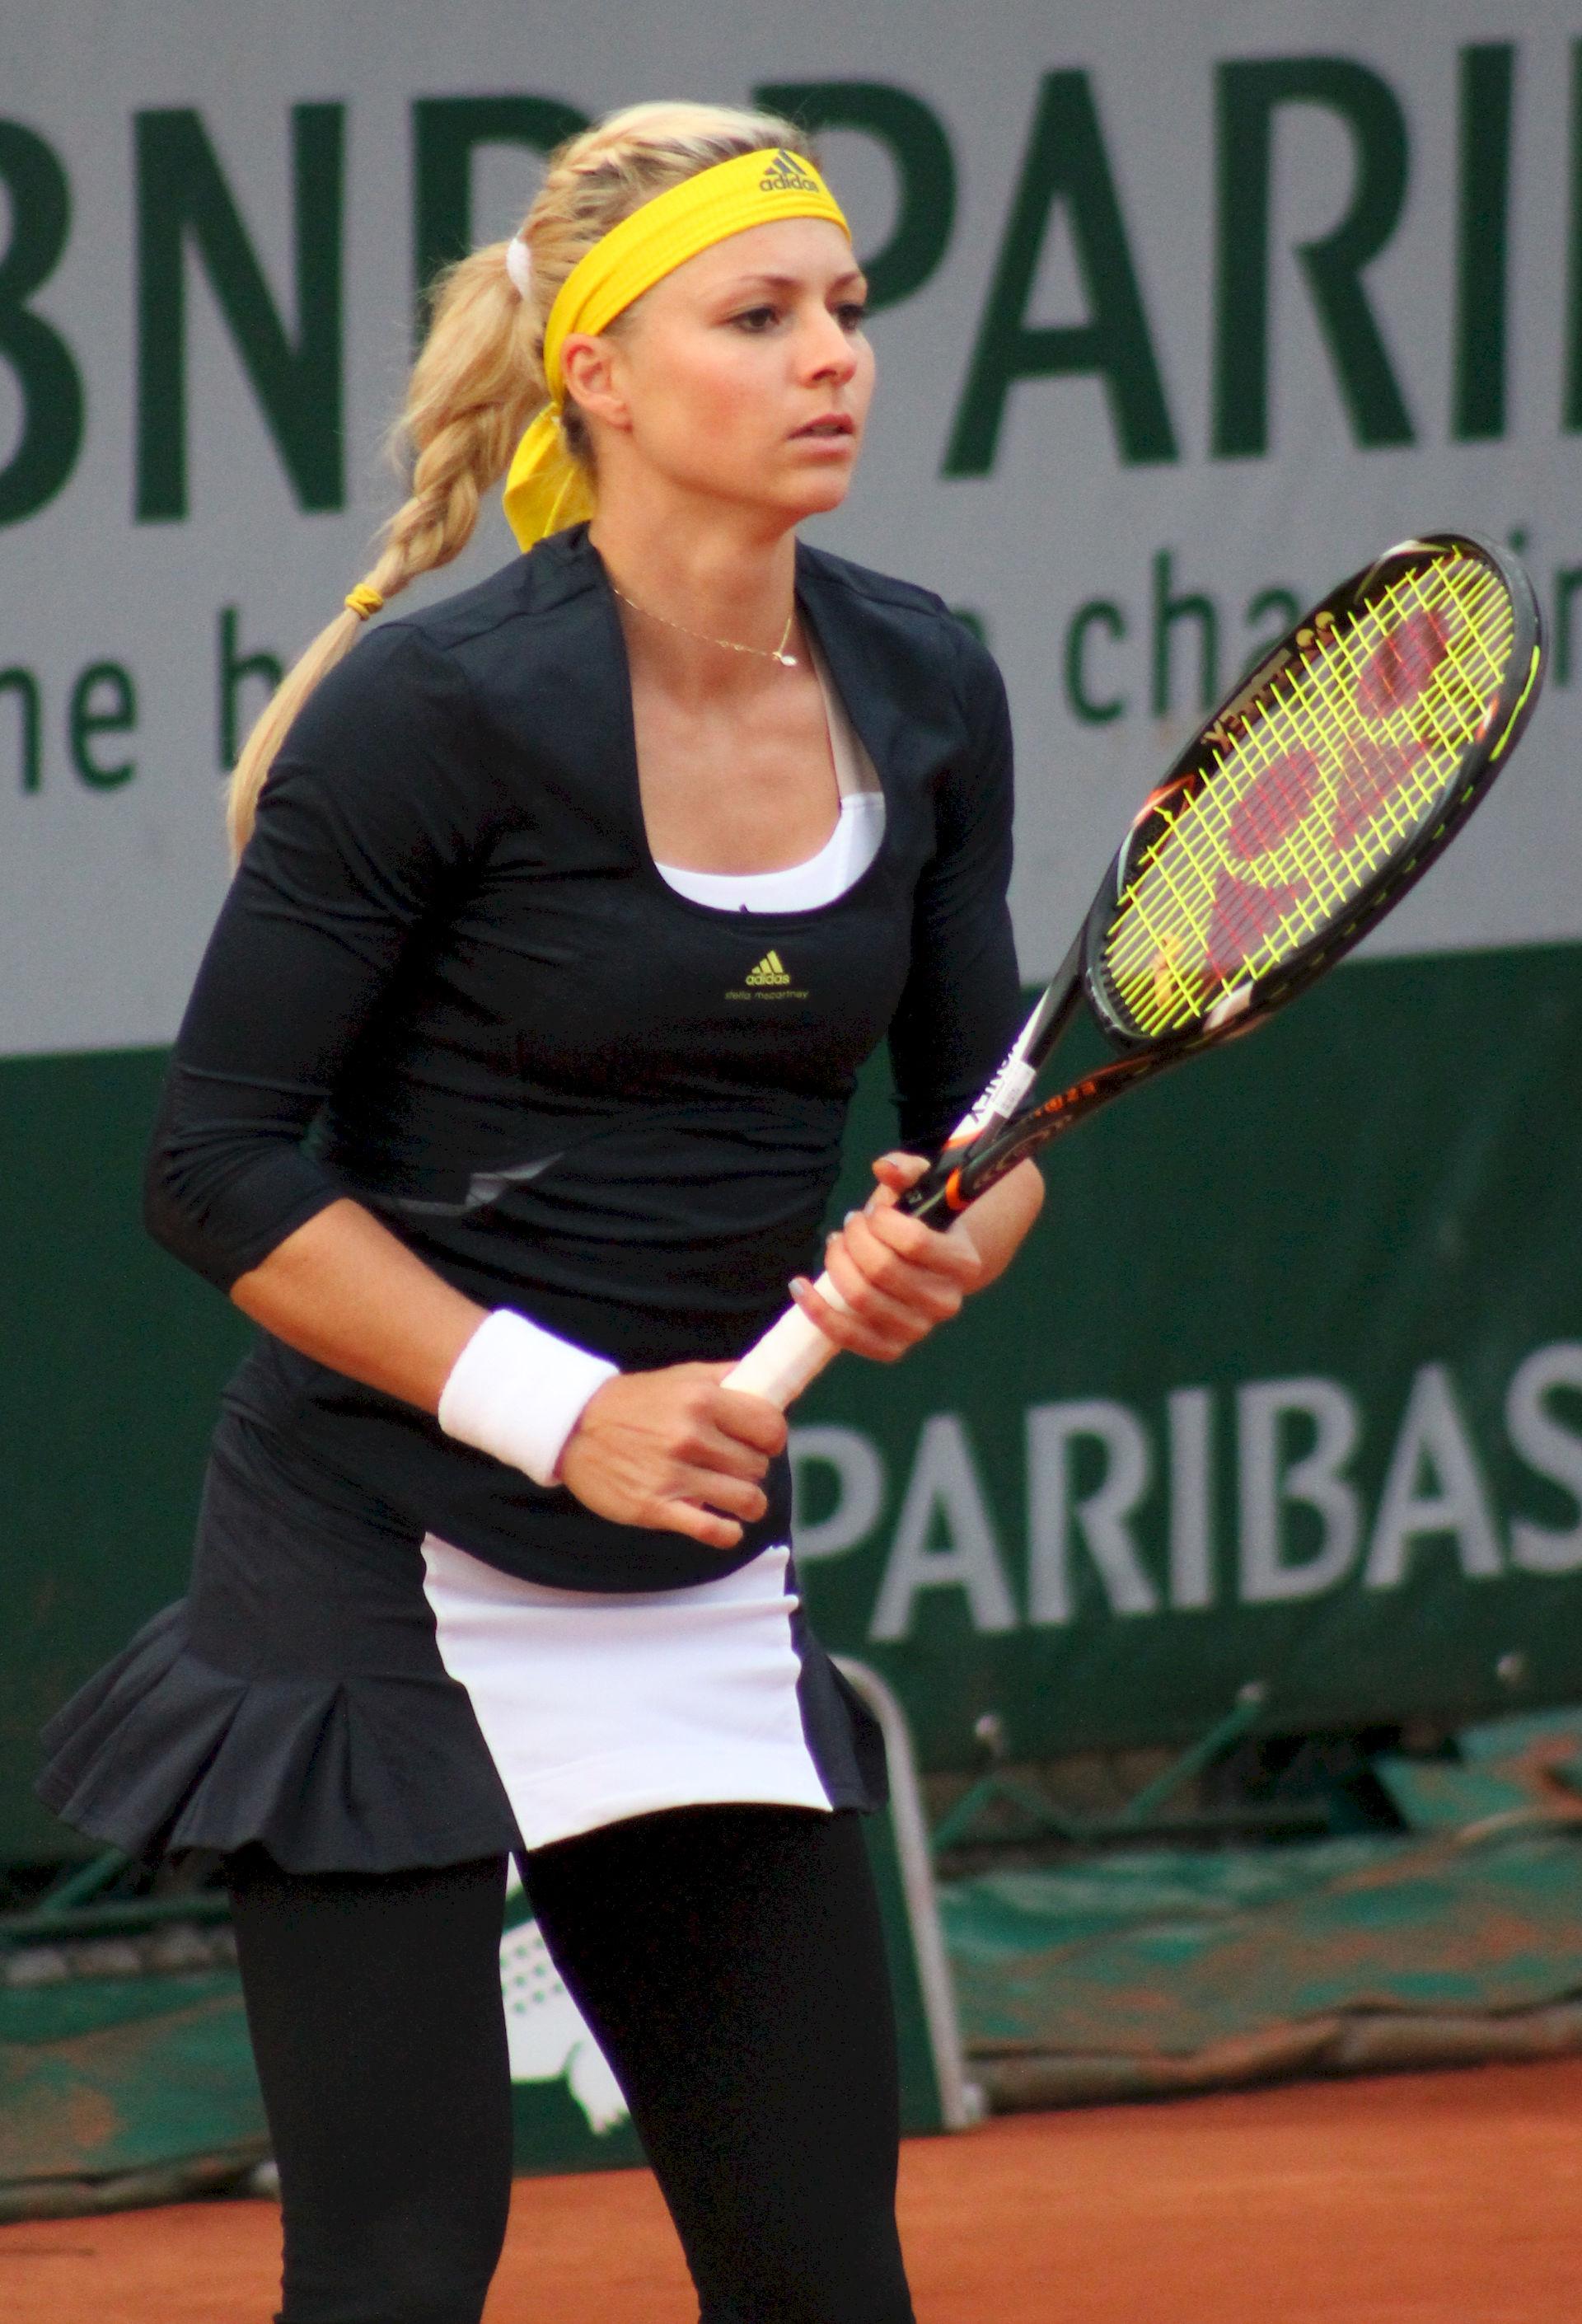 Photo of Maria Kirilenko: Russian tennis player